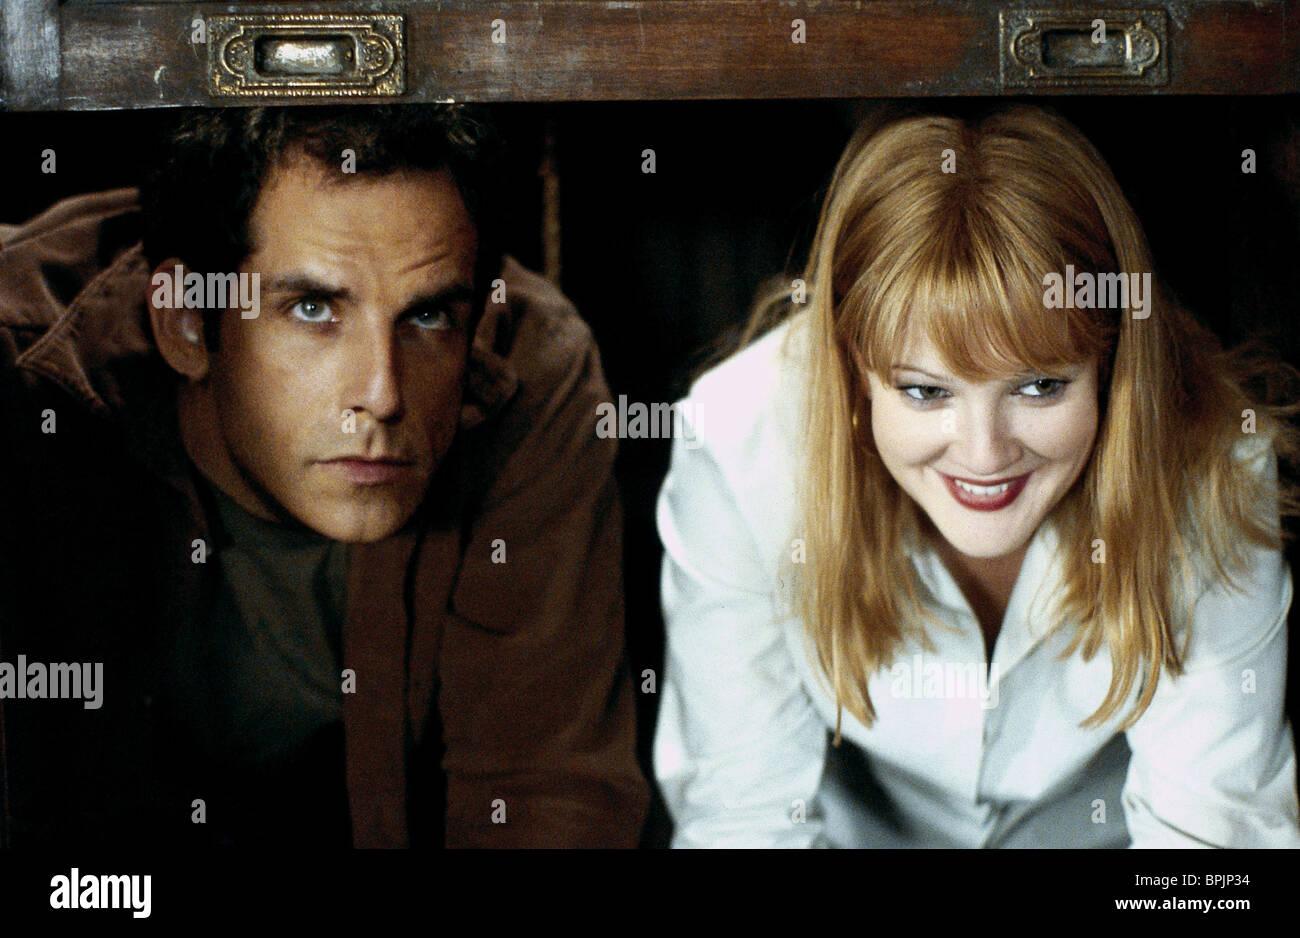 BEN STILLER & DREW BARRYMORE OUR HOUSE; DUPLEX (2003) - Stock Image